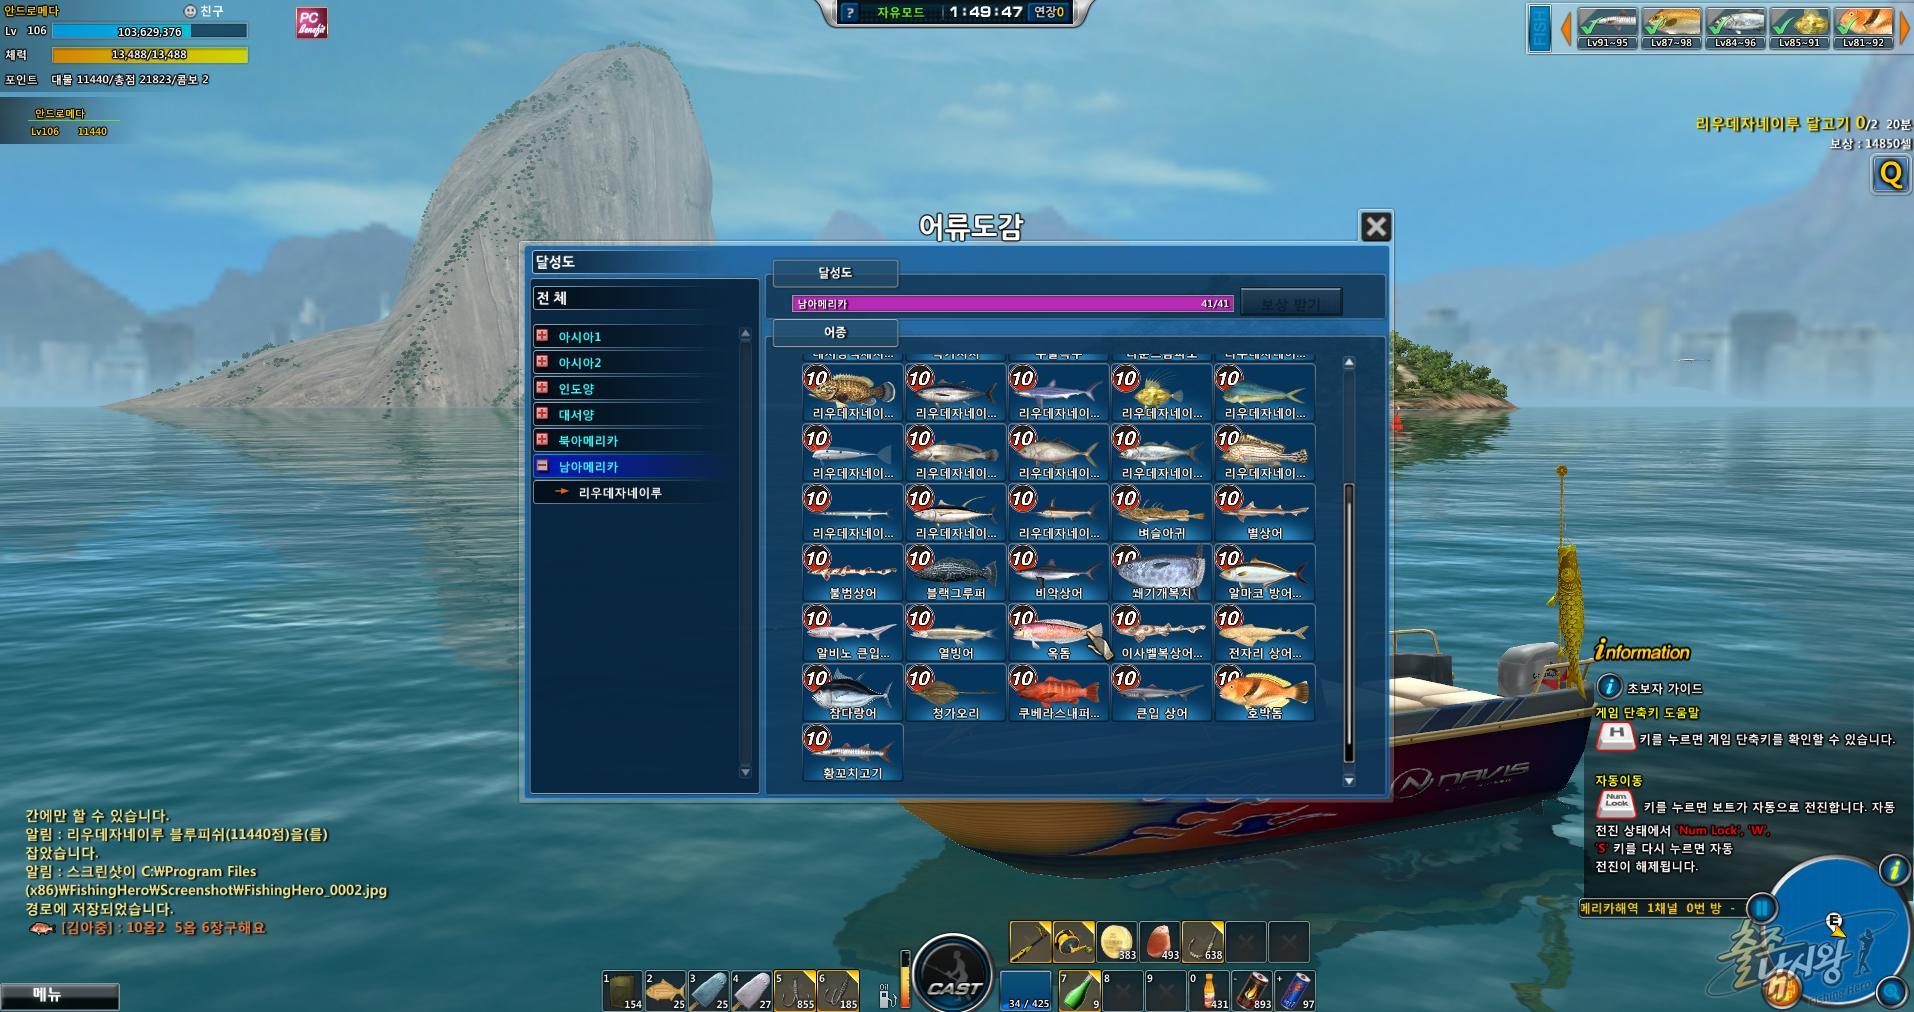 FishingHero_0003.jpg